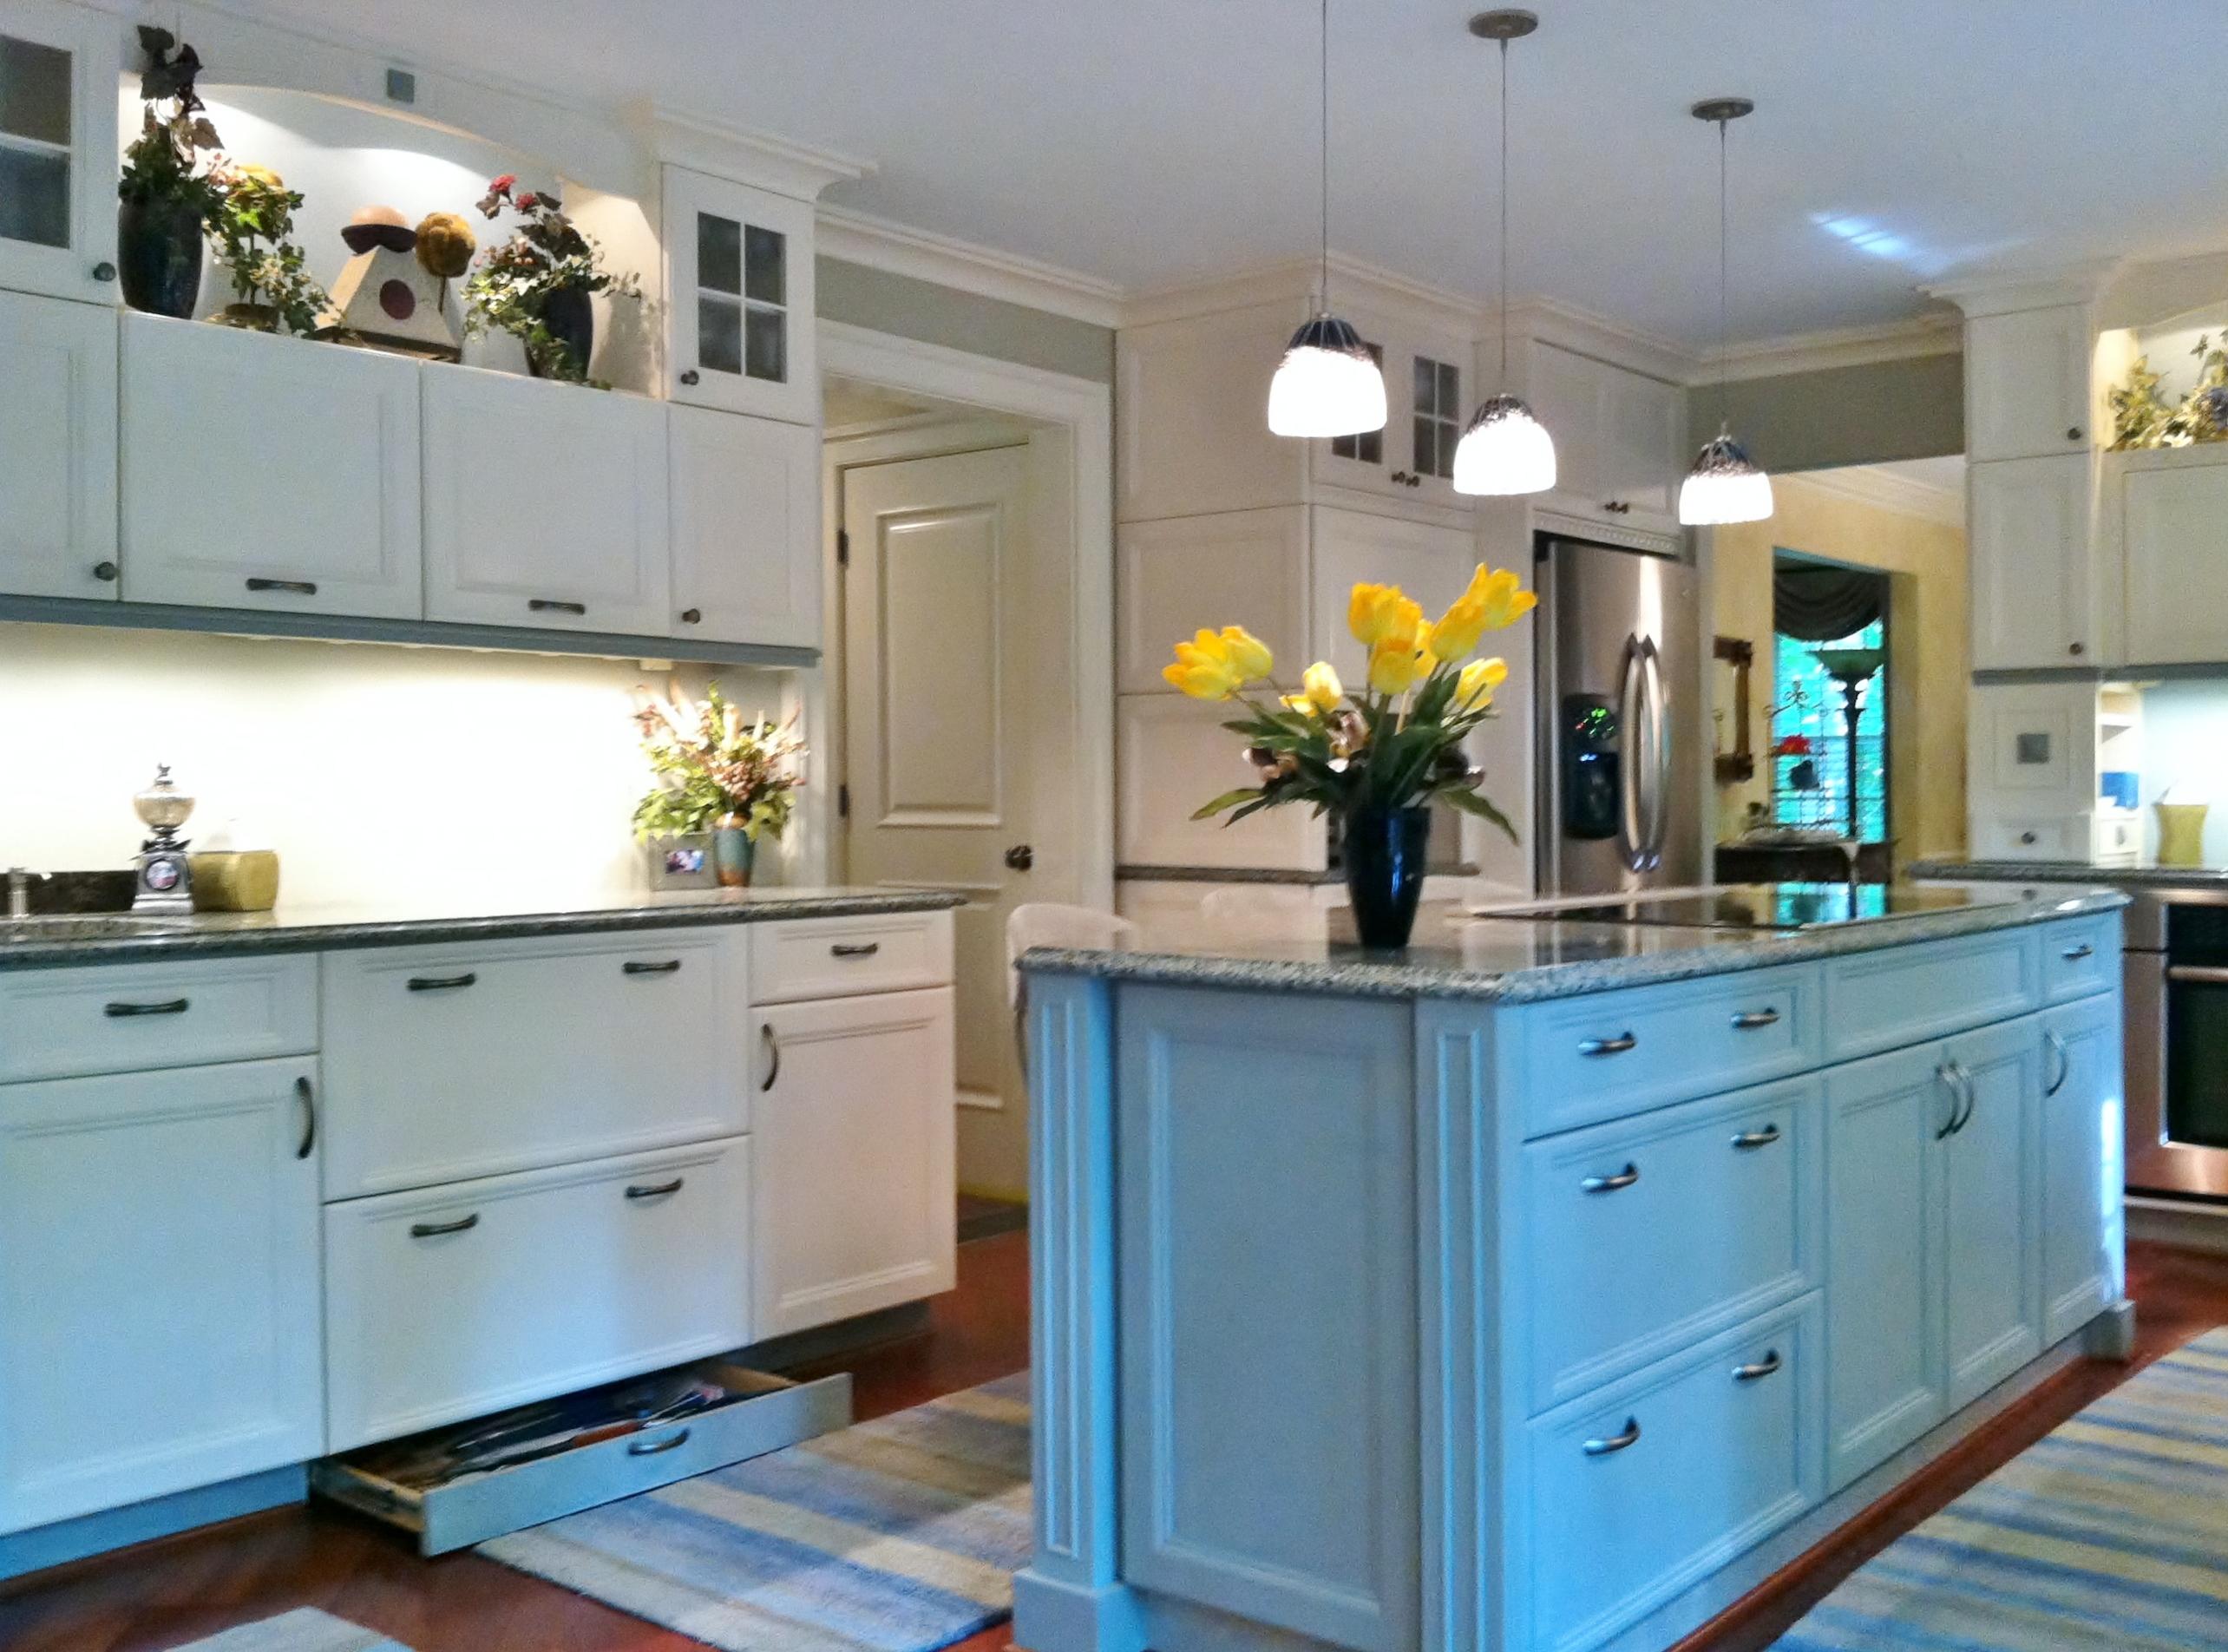 Kitchen cabinet toe kick ideas | Hawk Haven